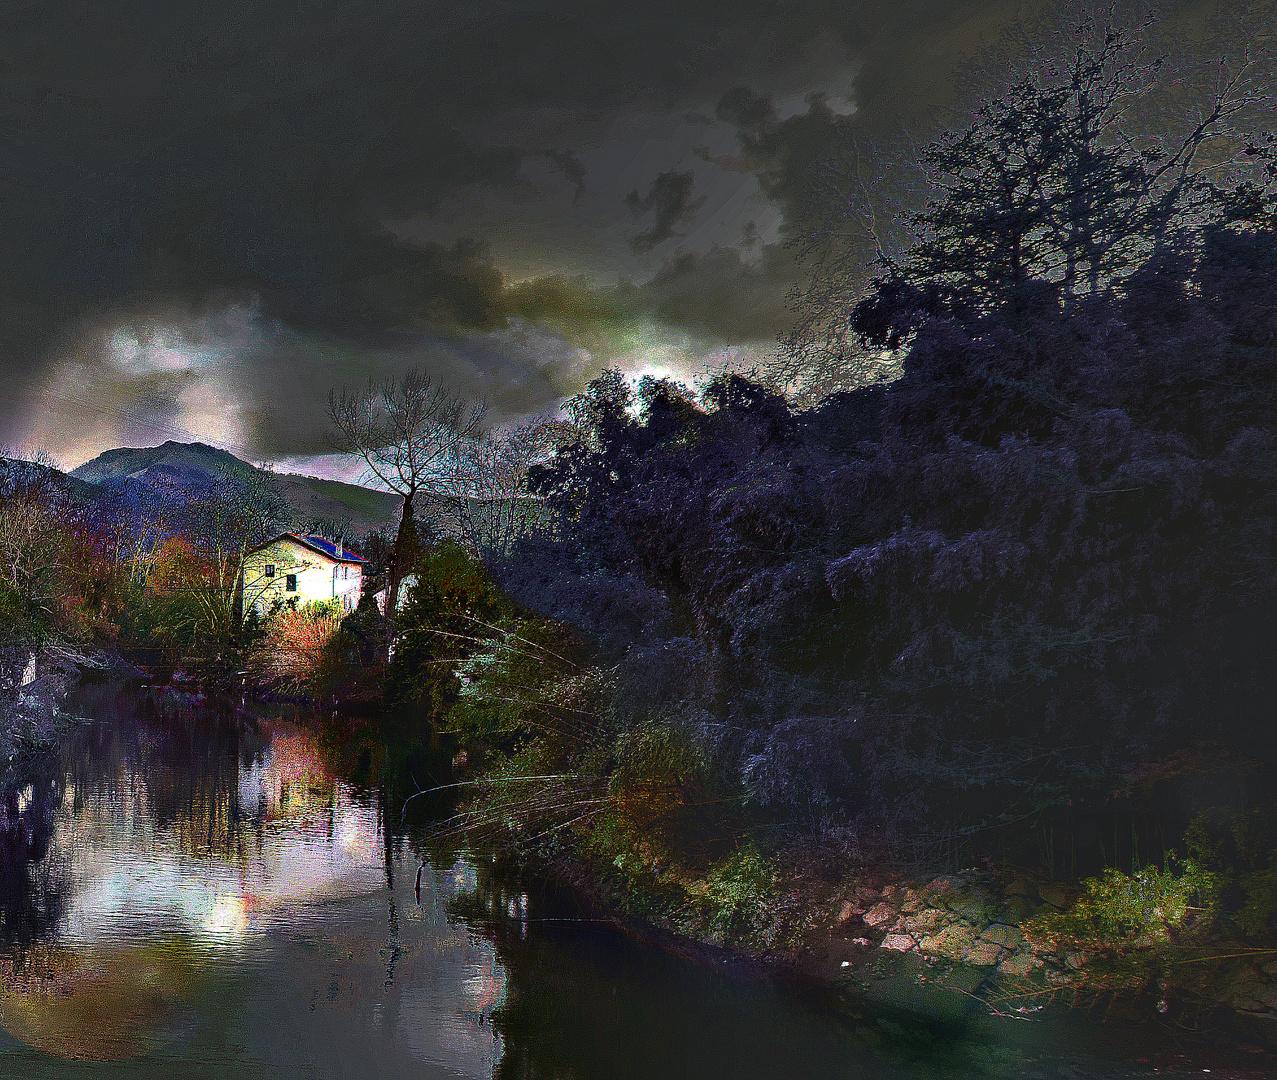 Arratsaldean (noche/anochecer)